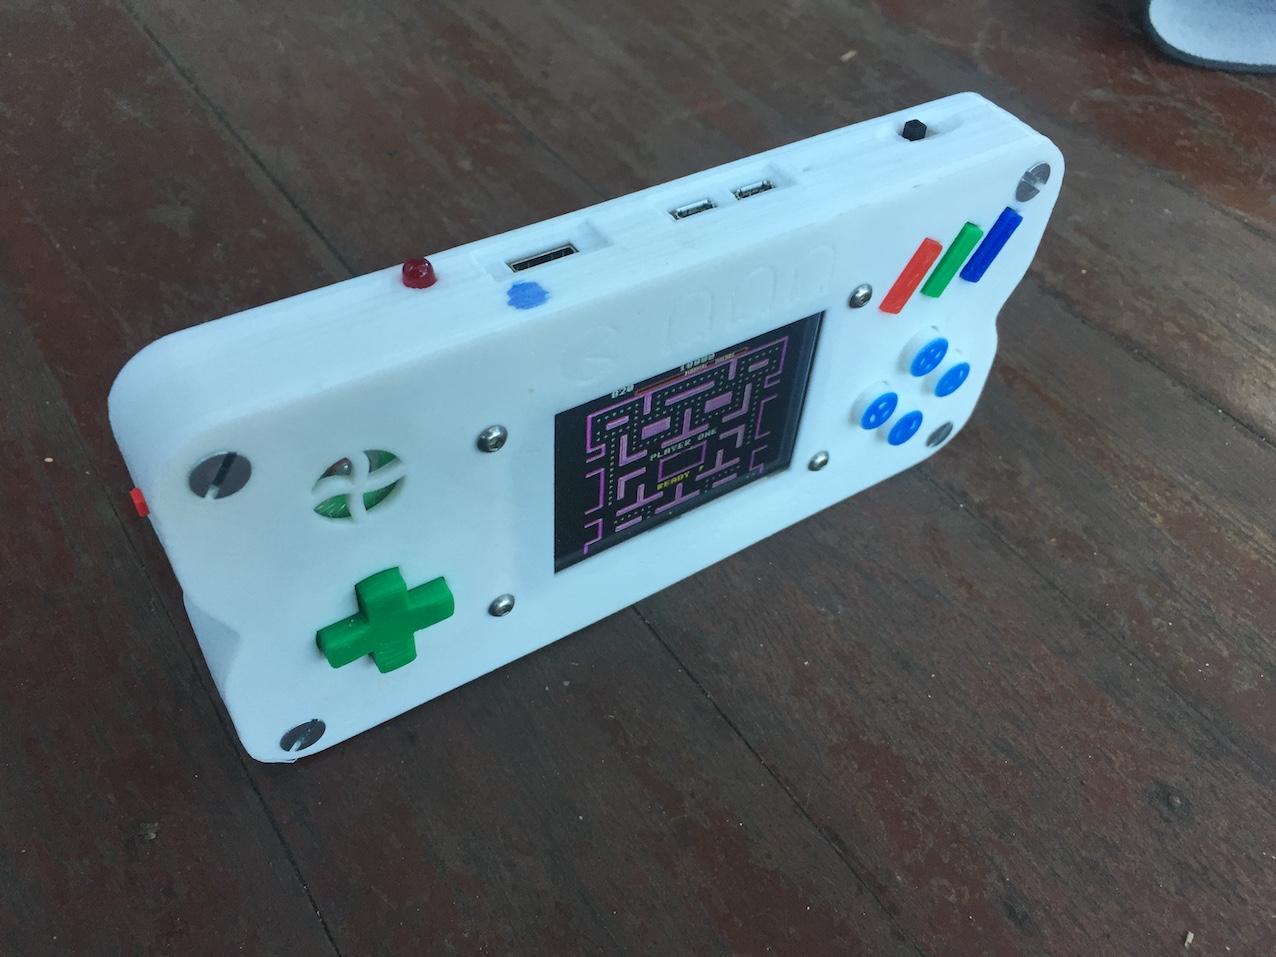 $20 Portable Raspberry Pi Game Console